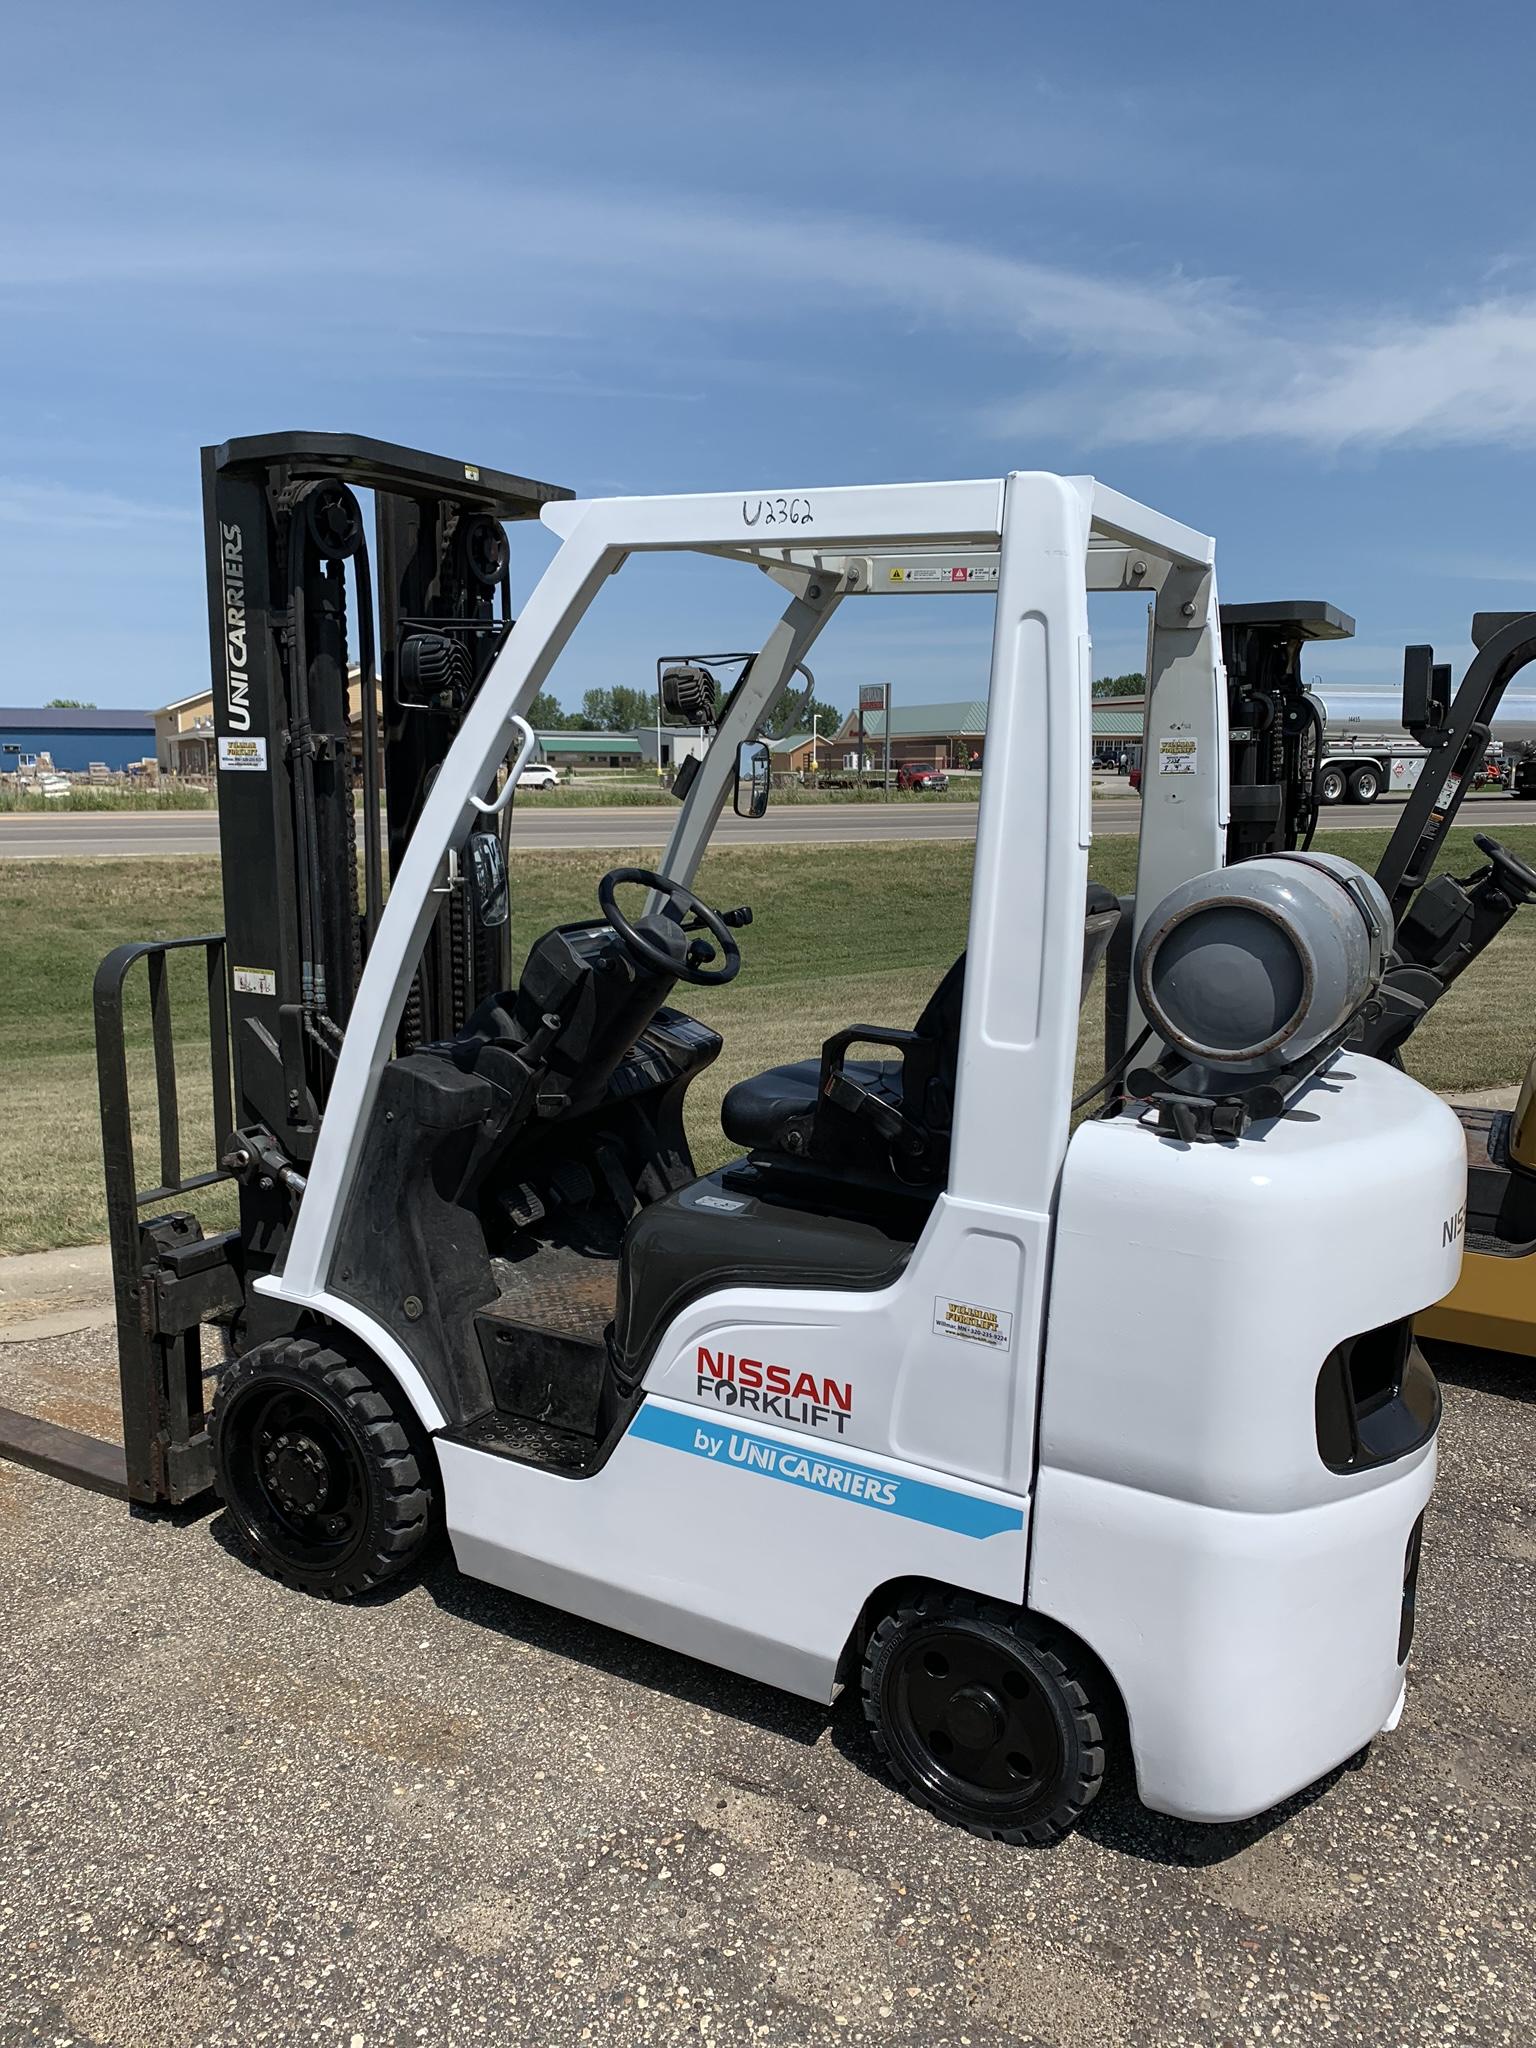 Nissan Forklift FCG30 N2362